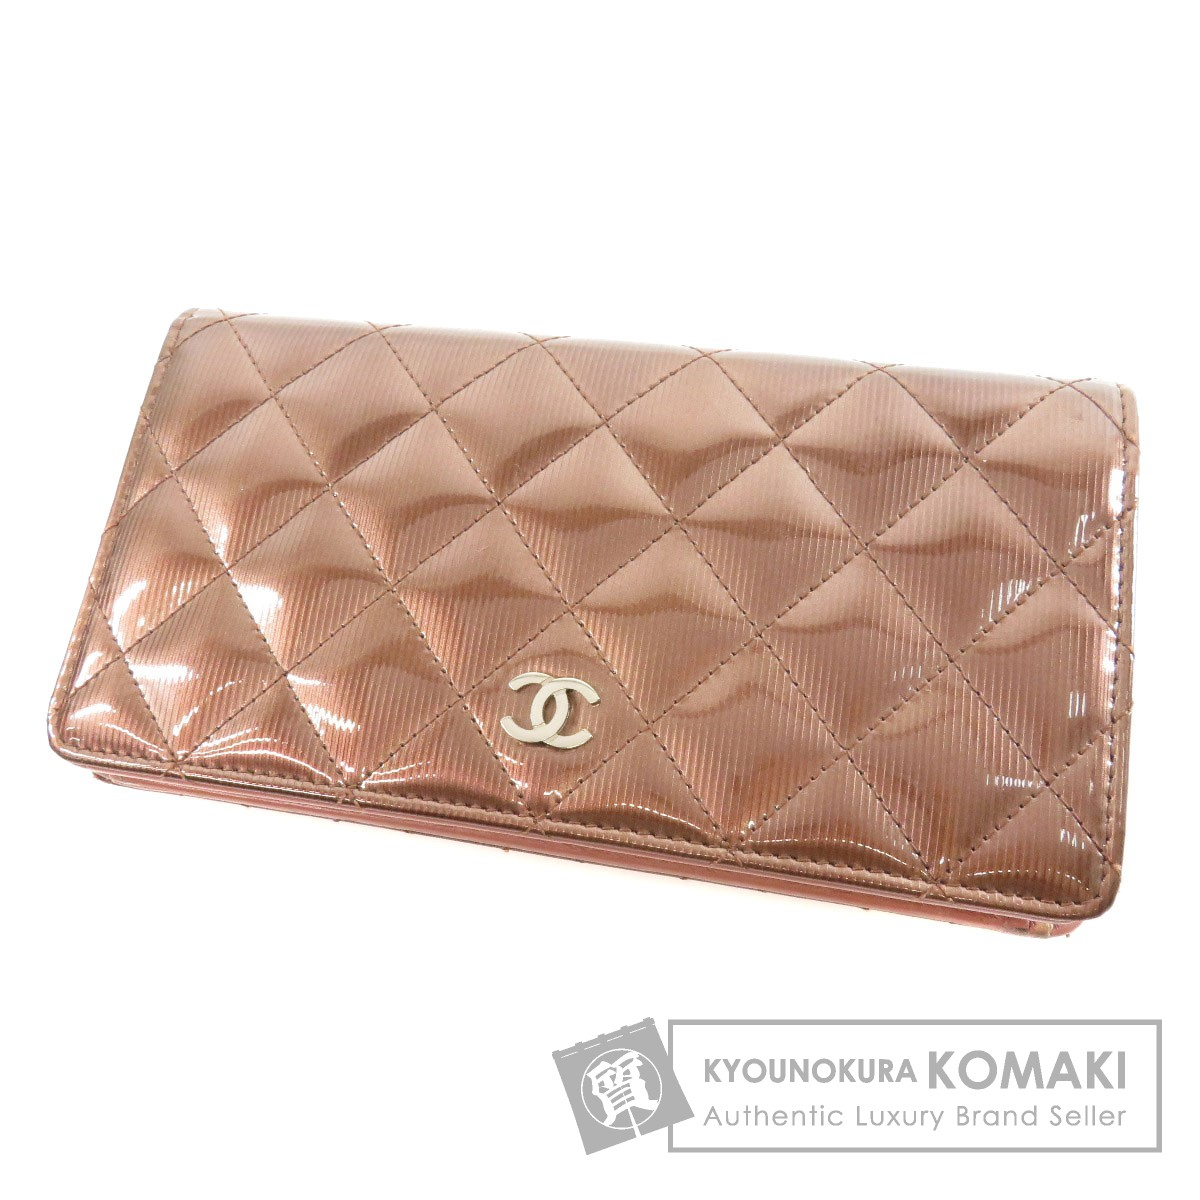 CHANEL マトラッセ 二つ折り財布(小銭入れあり) ビニール レディース 【中古】【シャネル】